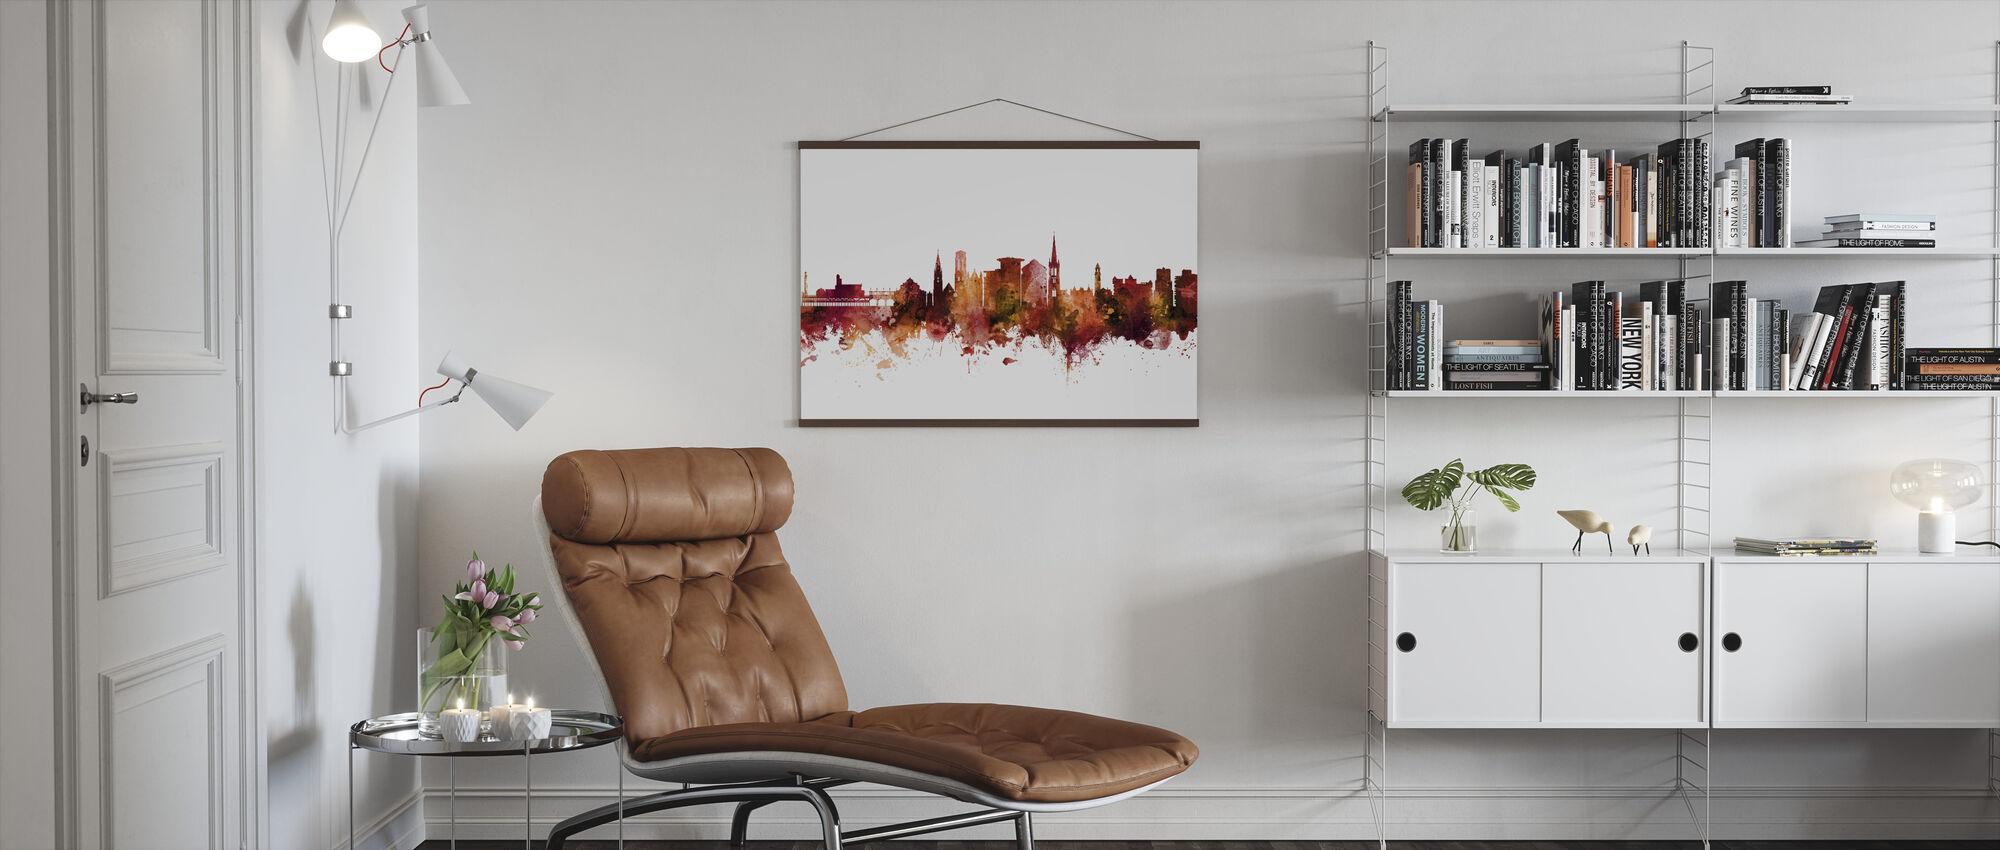 Bournemouth England Skyline - Poster - Living Room